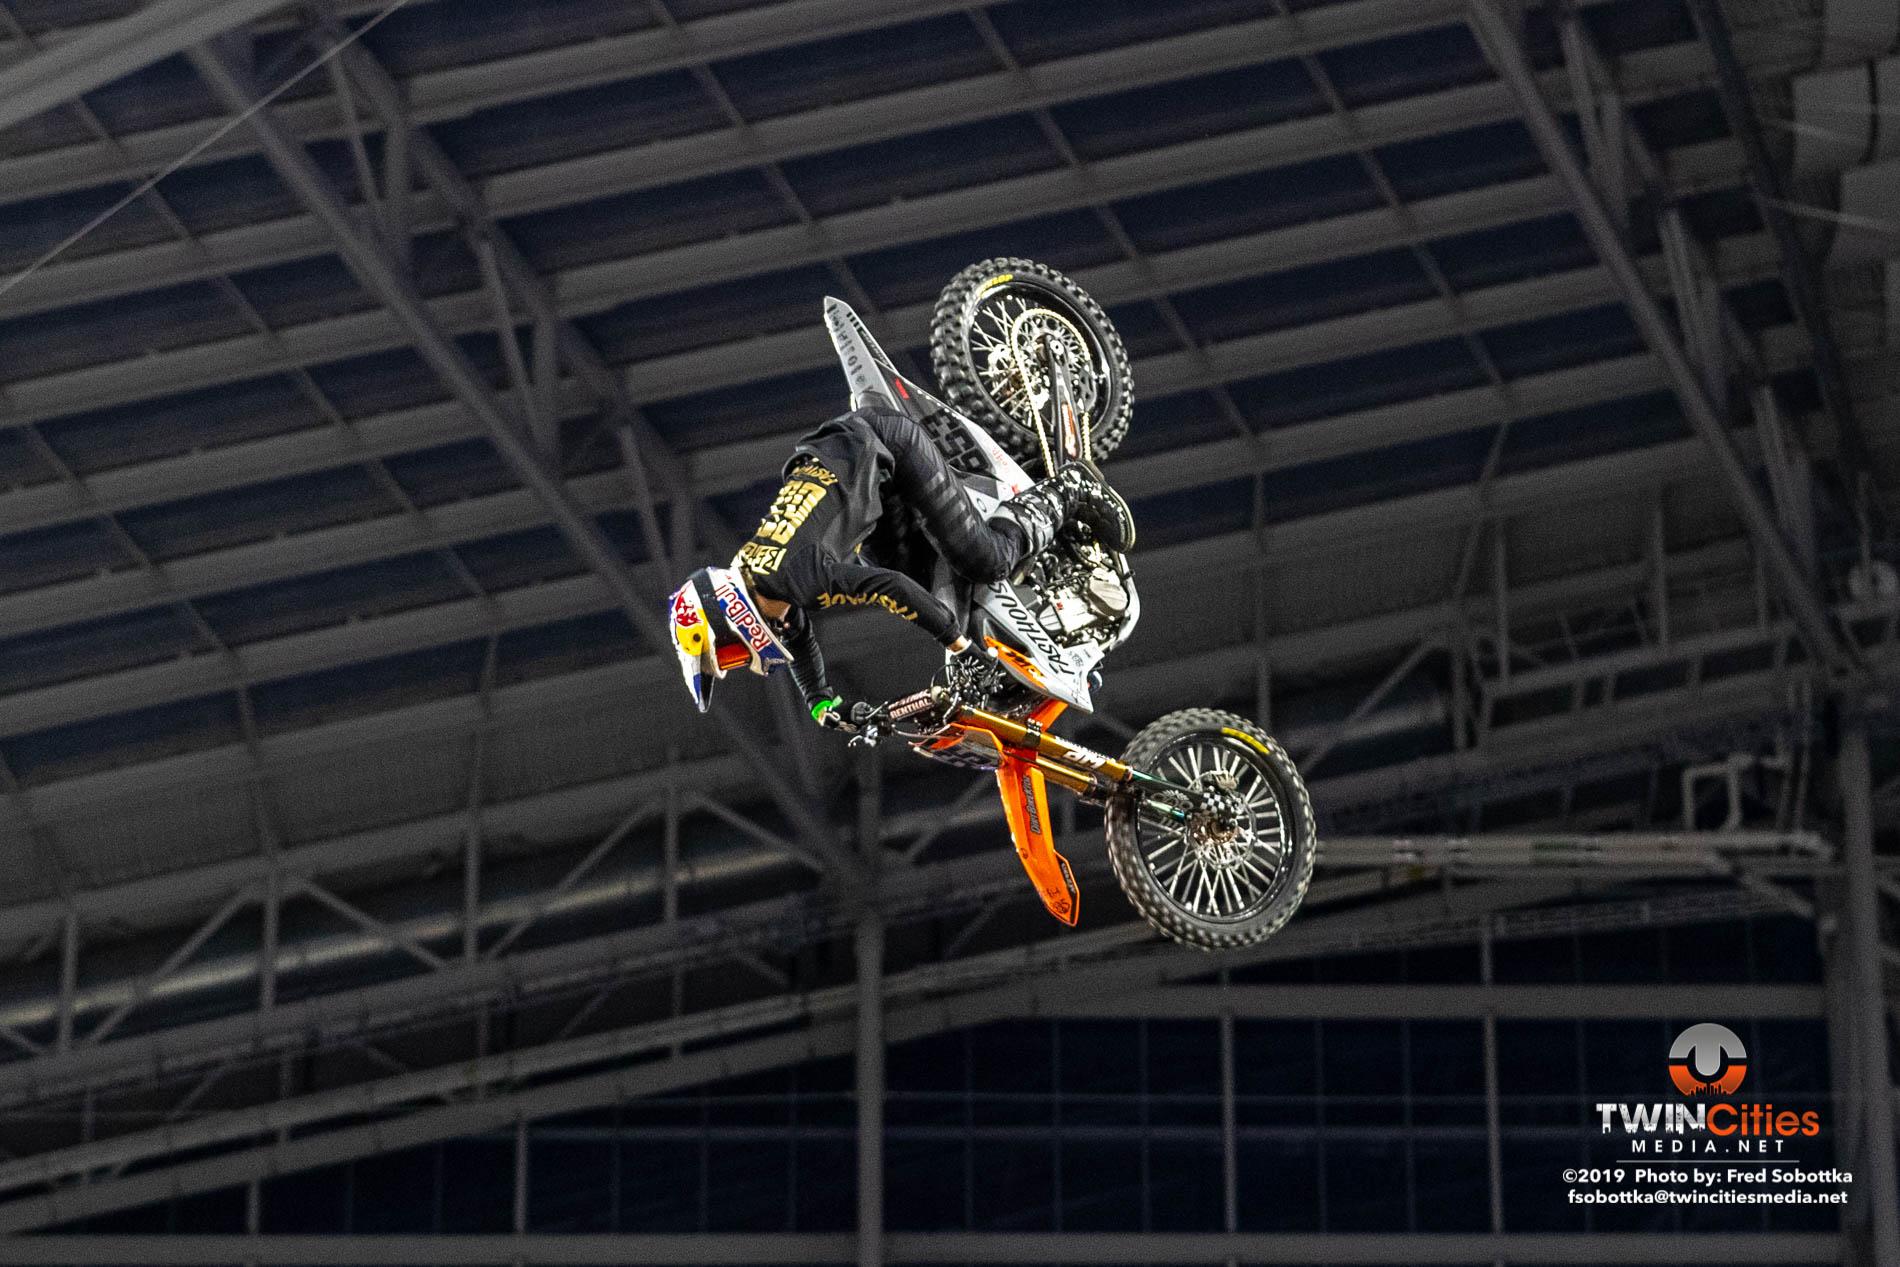 Moto-X-Quarterpipe-High-Air-06